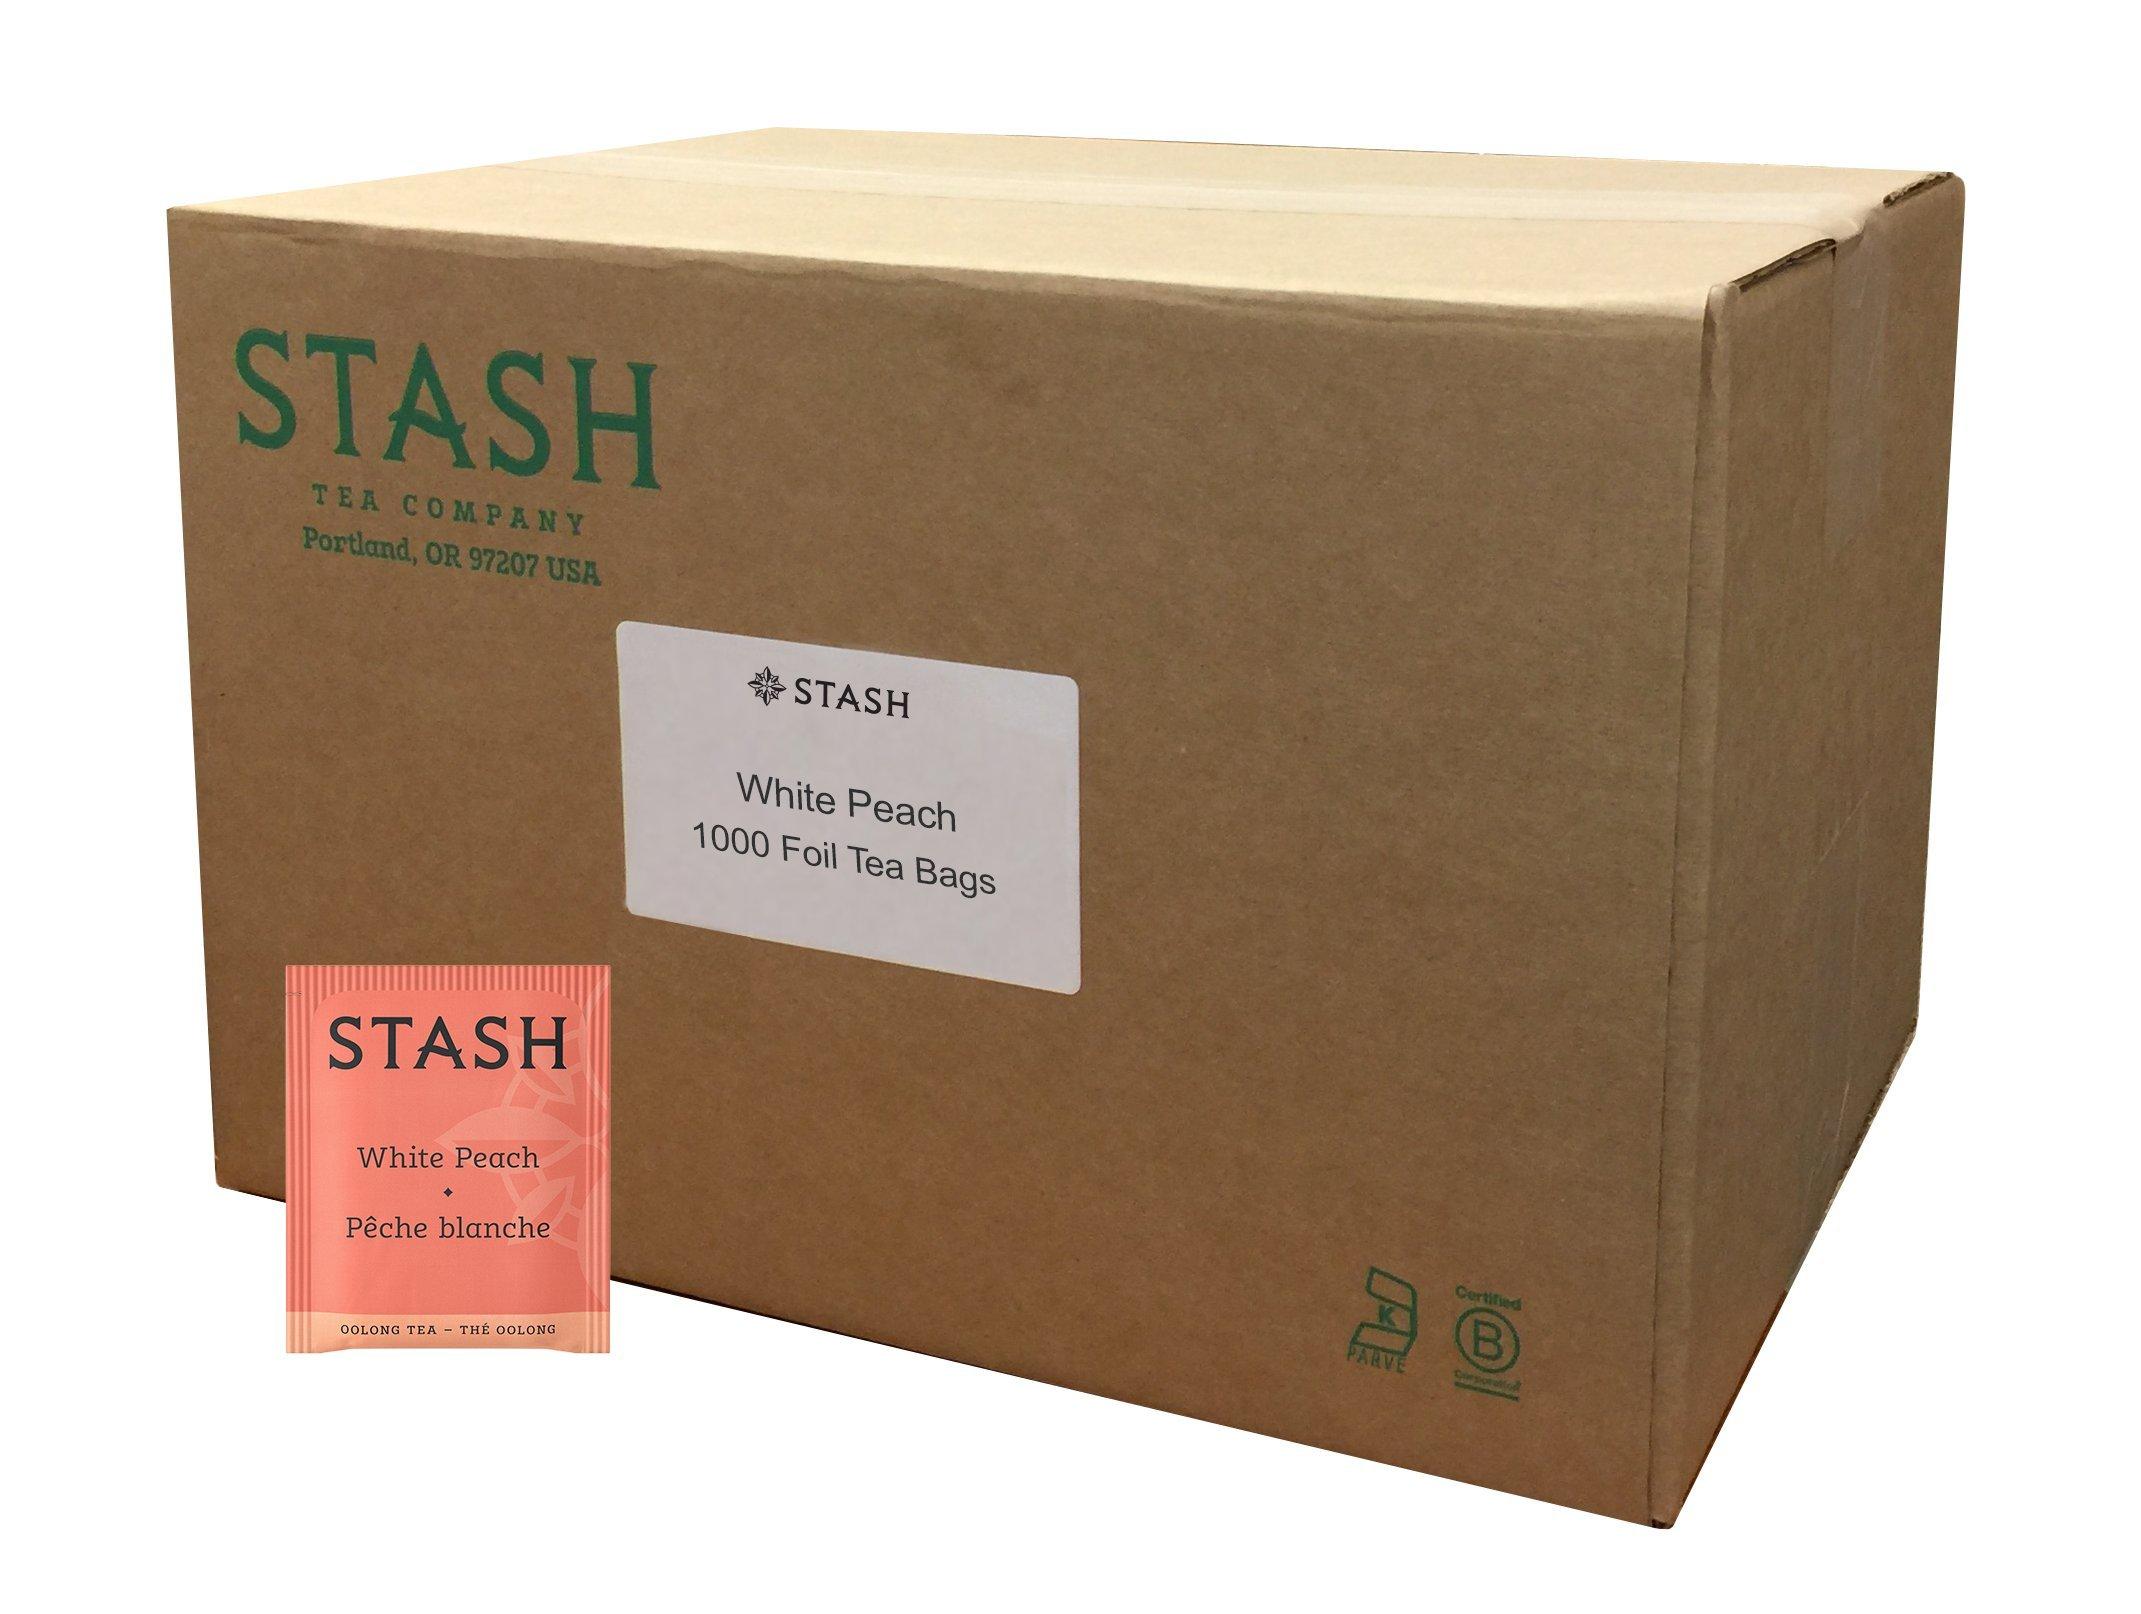 Stash Tea White Peach Wuyi Oolong Tea 1000 Tea Bags in Foil Individual Oolong Black Tea Bags, Use in Teapots Mugs or Cups, Brew Hot Tea or Iced Tea by Stash Tea